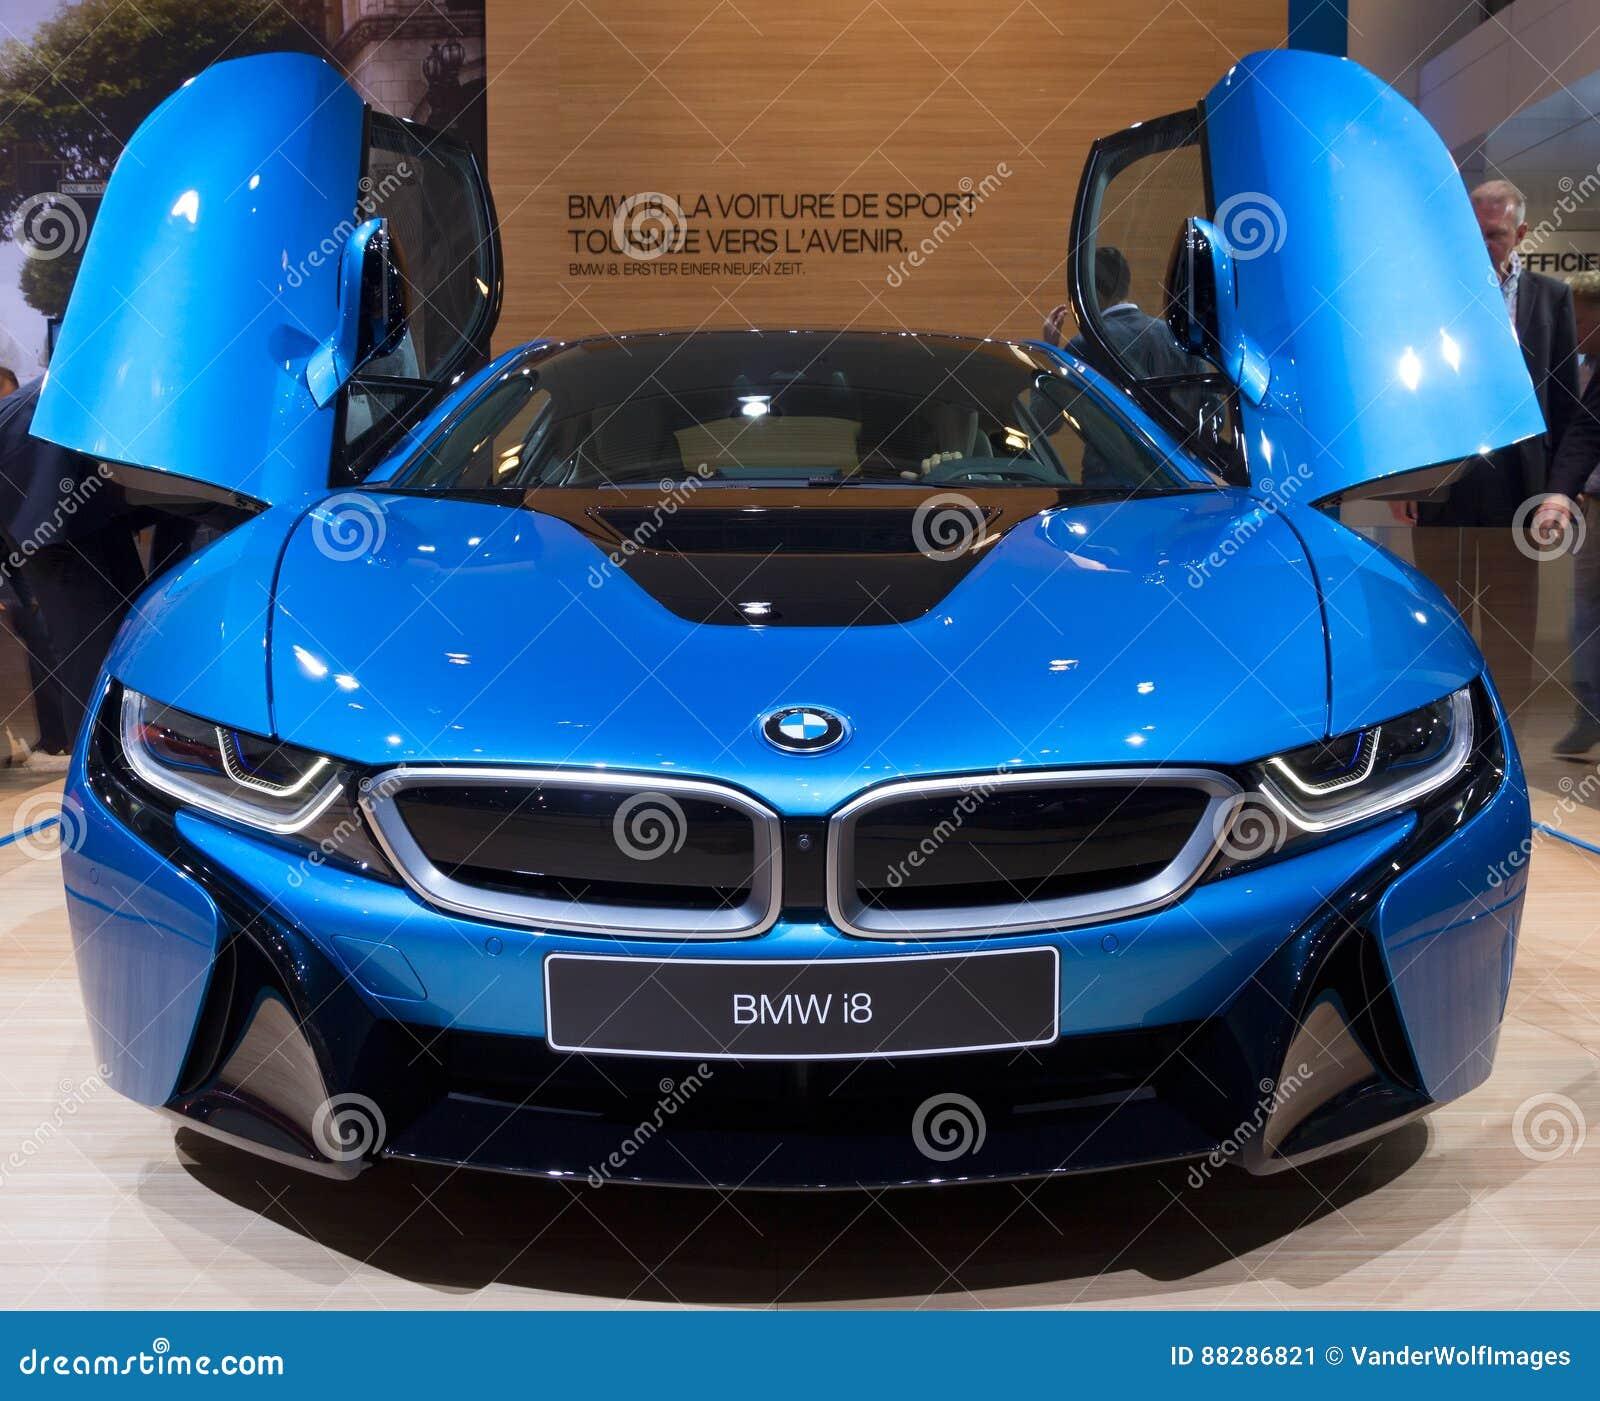 Bmw I8 Electric: BMW I8 Electric Sports Car Editorial Photo. Image Of 2015